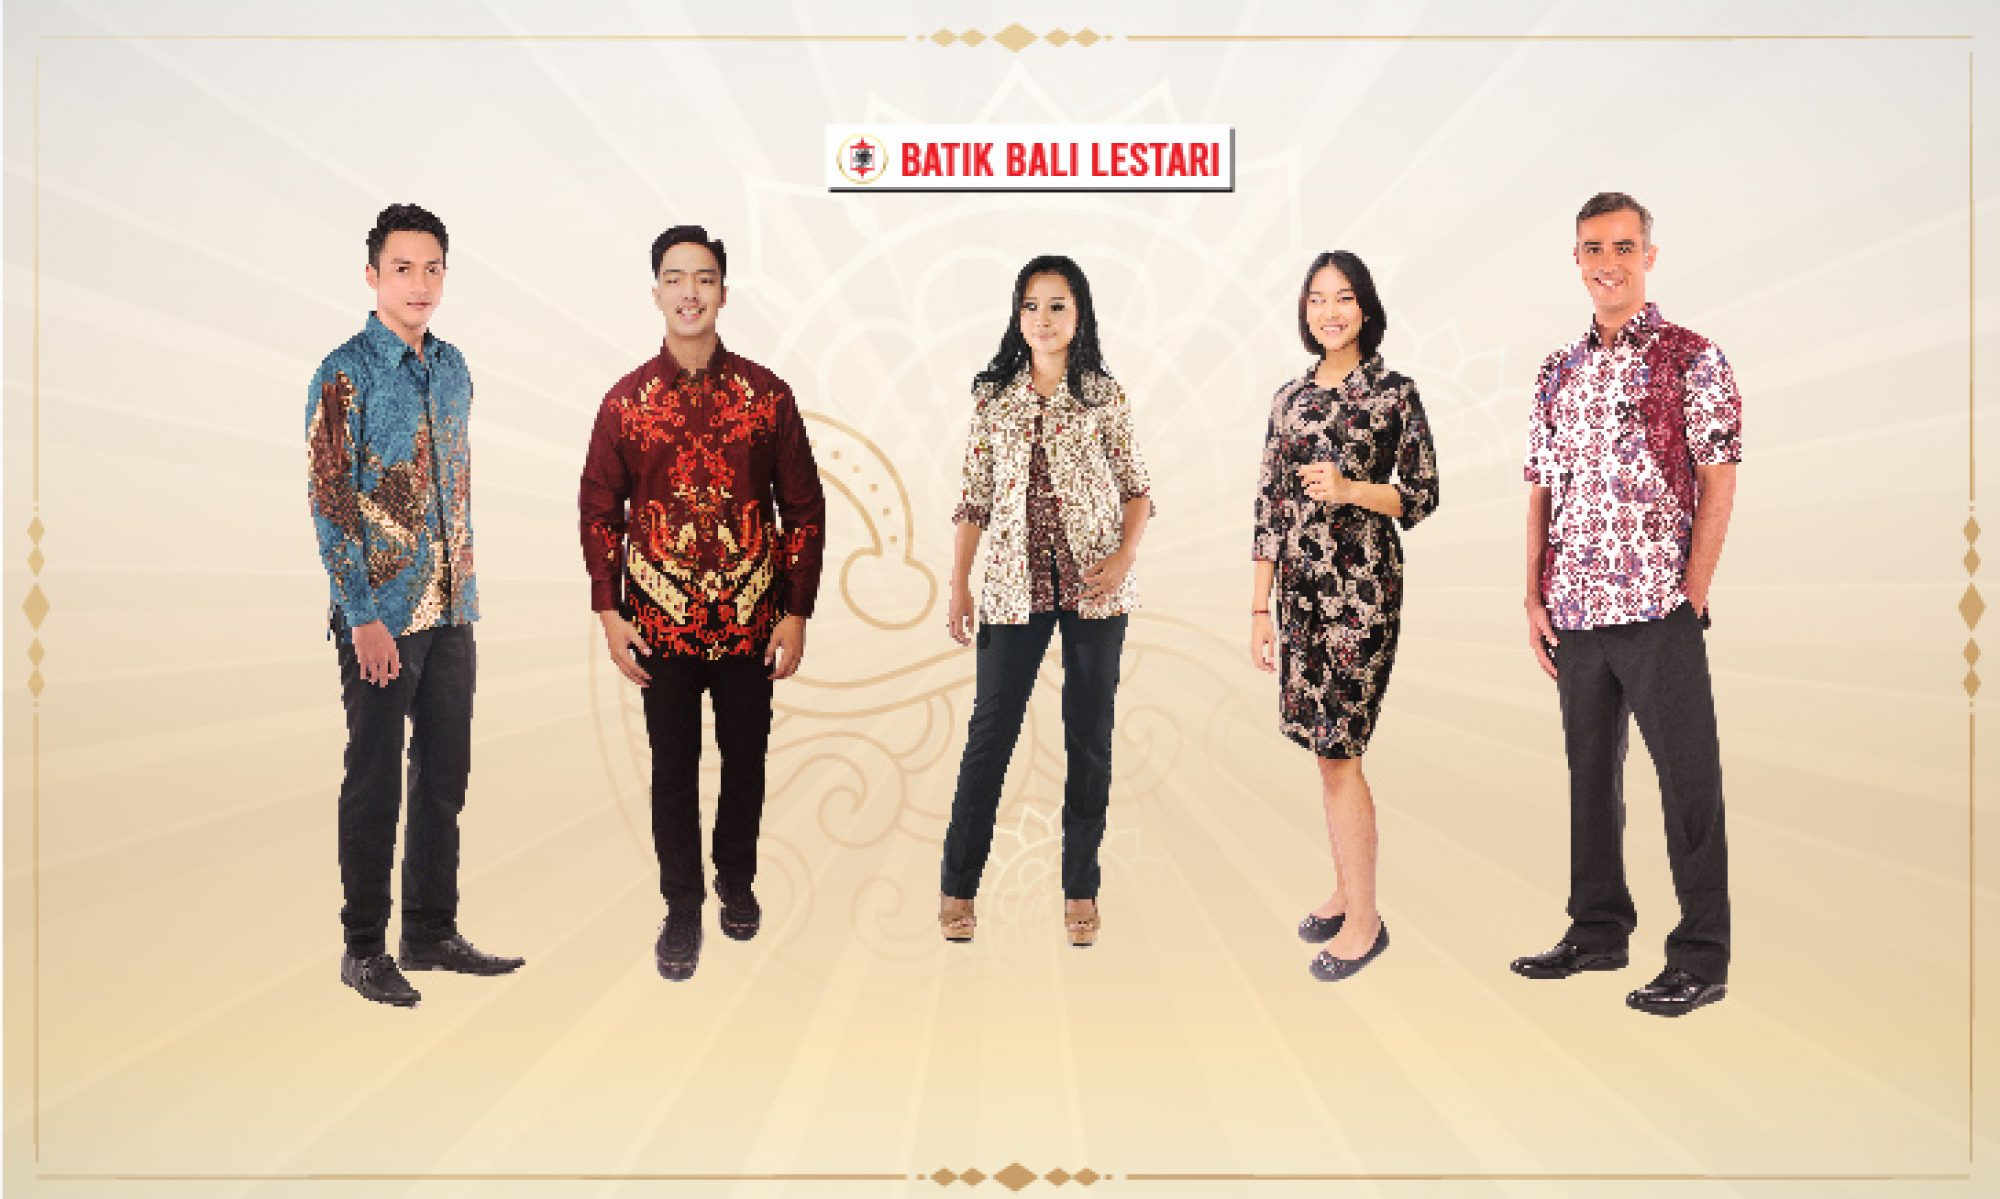 Batik Bali Lestari